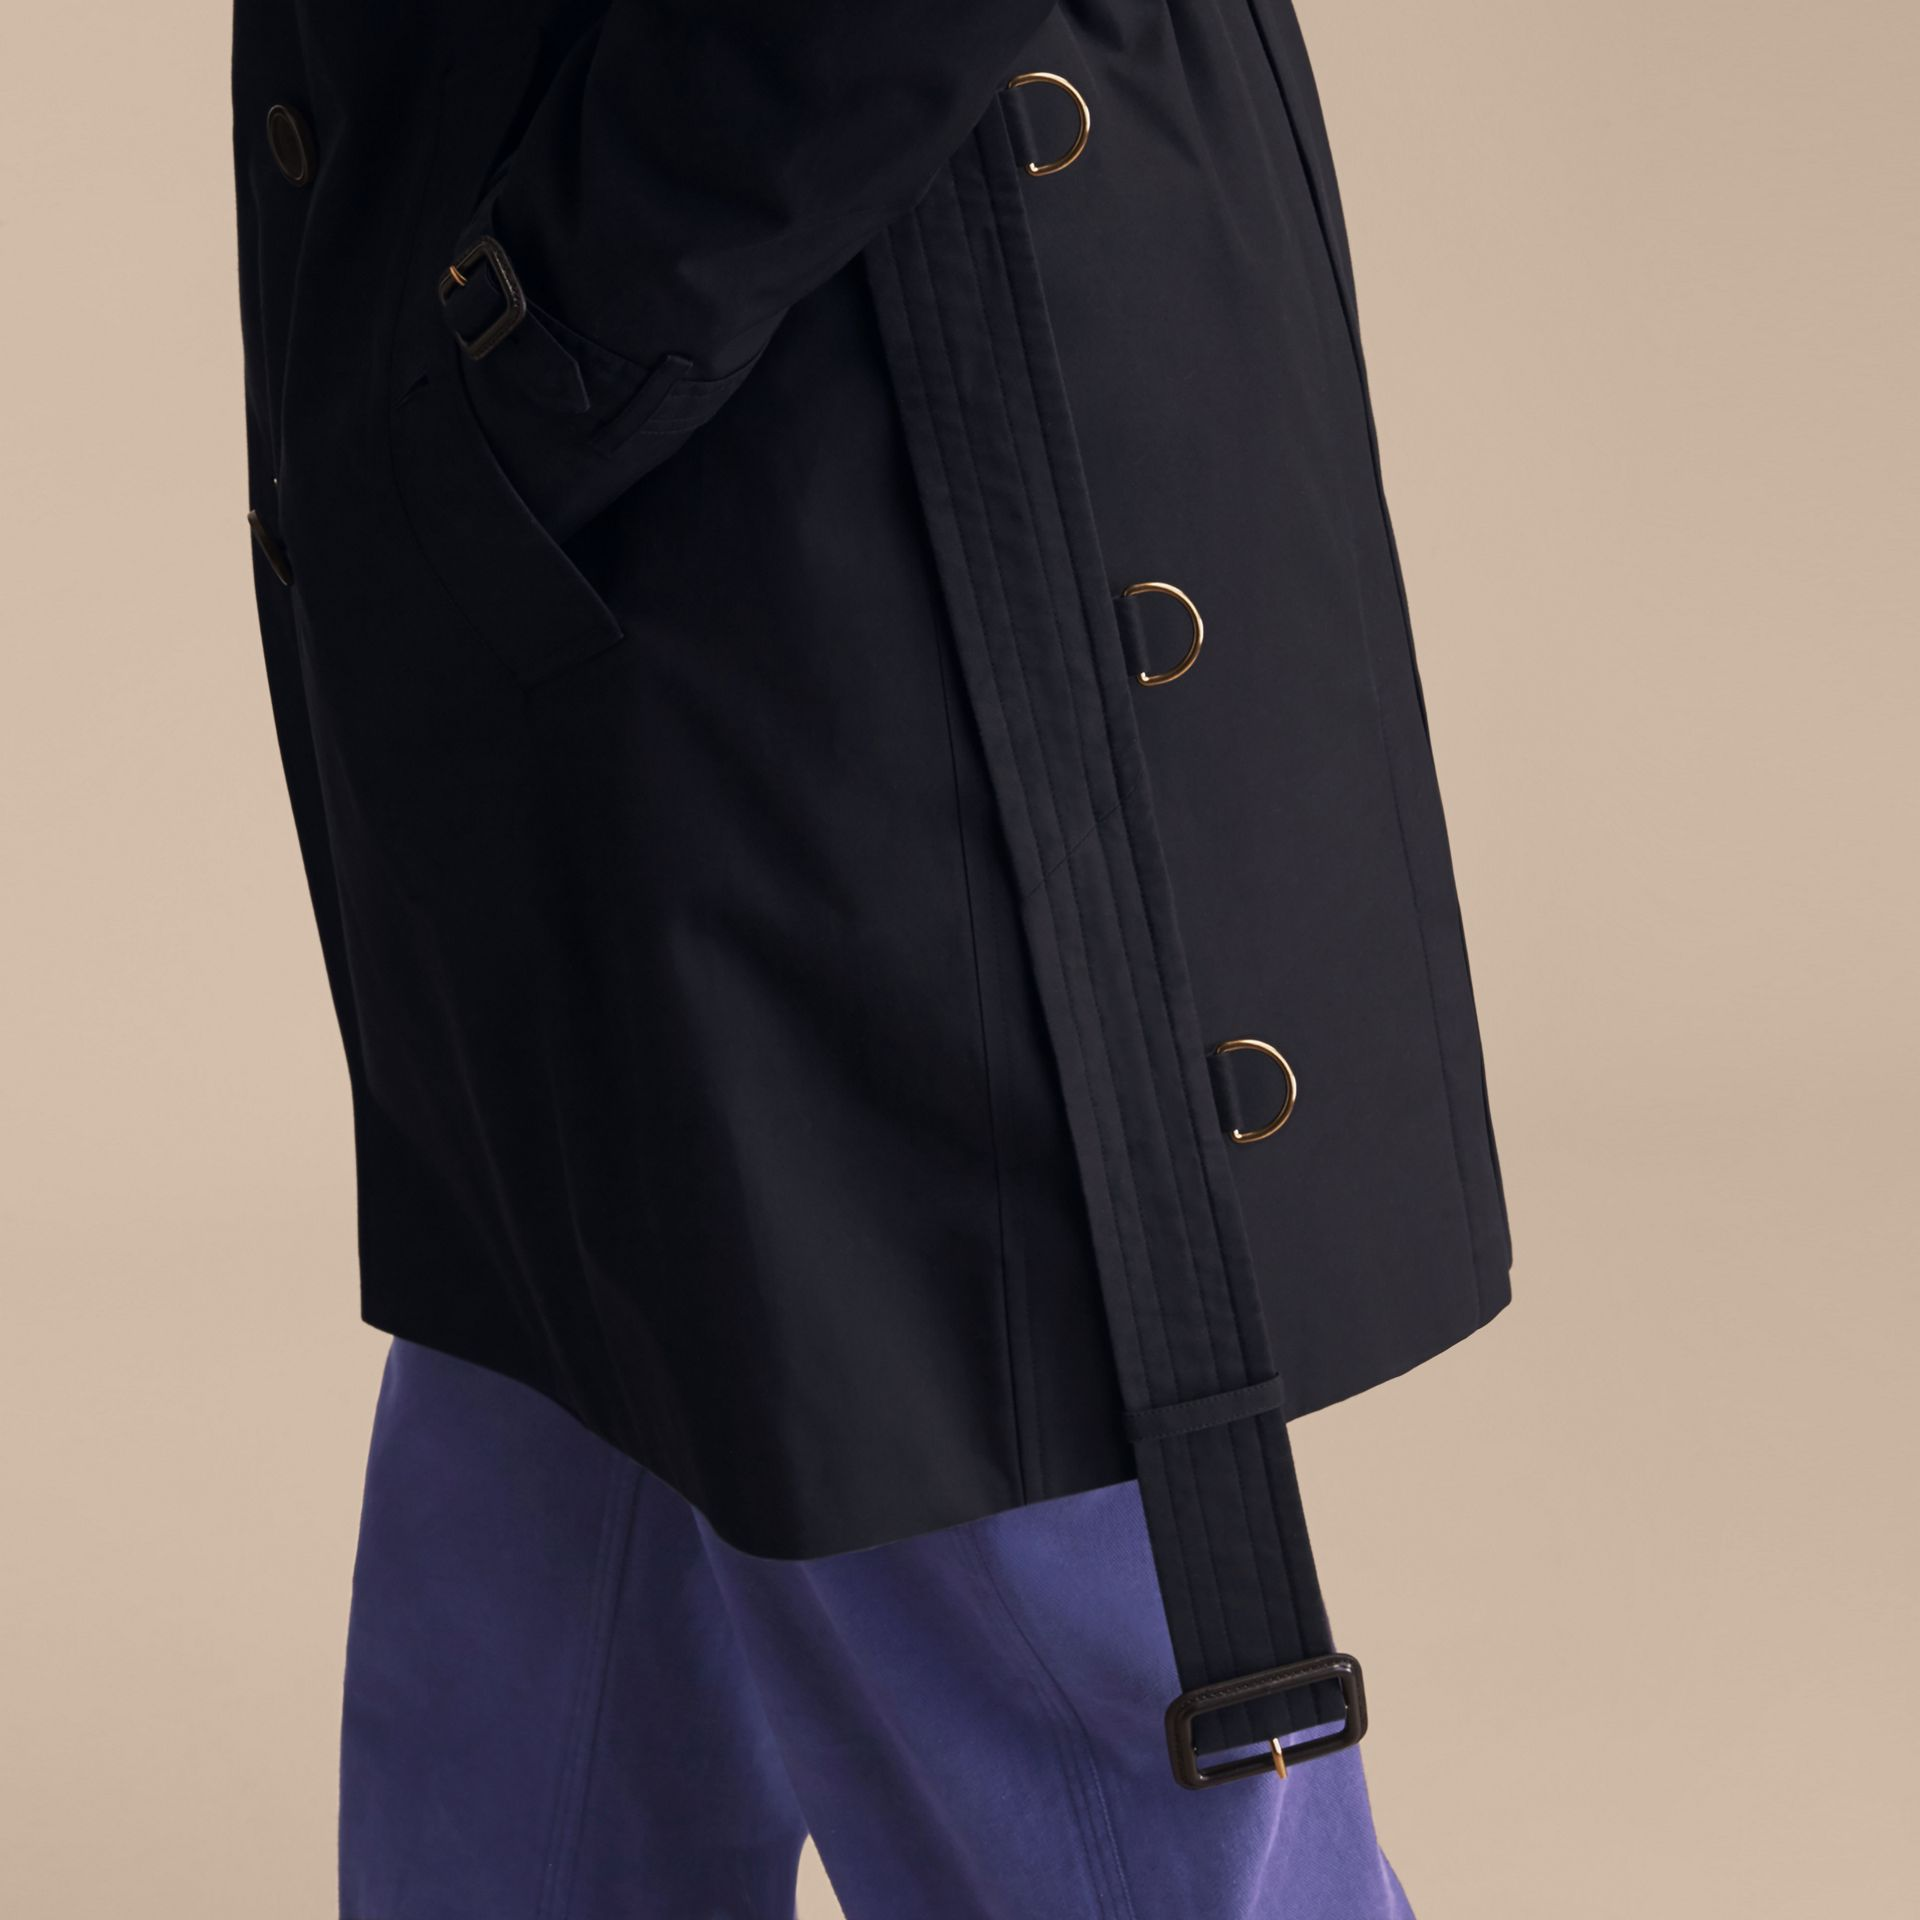 Azul marinho The Sandringham - Trench coat Heritage longo Azul Marinho - galeria de imagens 8